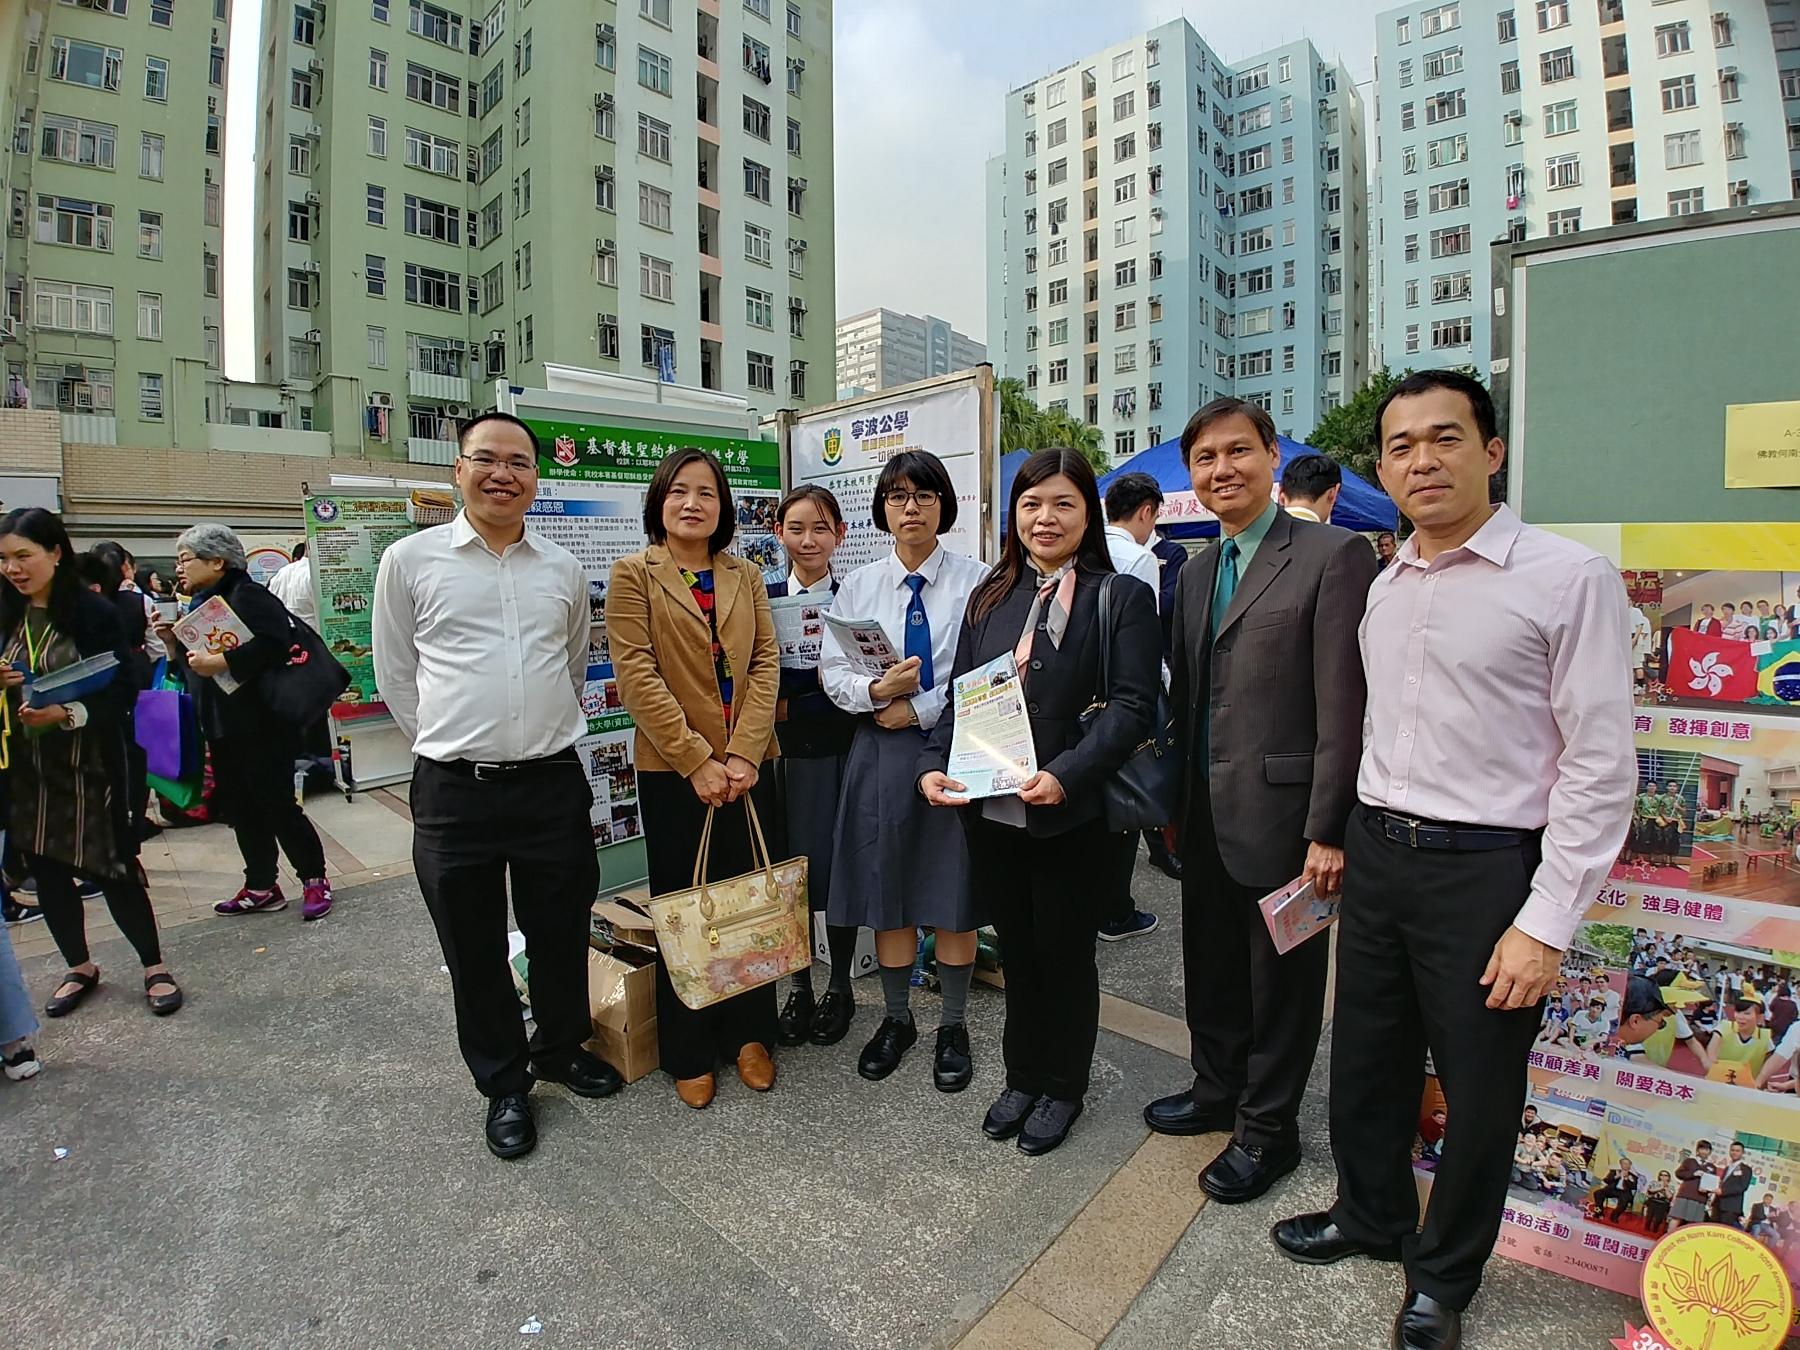 http://npc.edu.hk/sites/default/files/20190112_150957_hdr.jpg